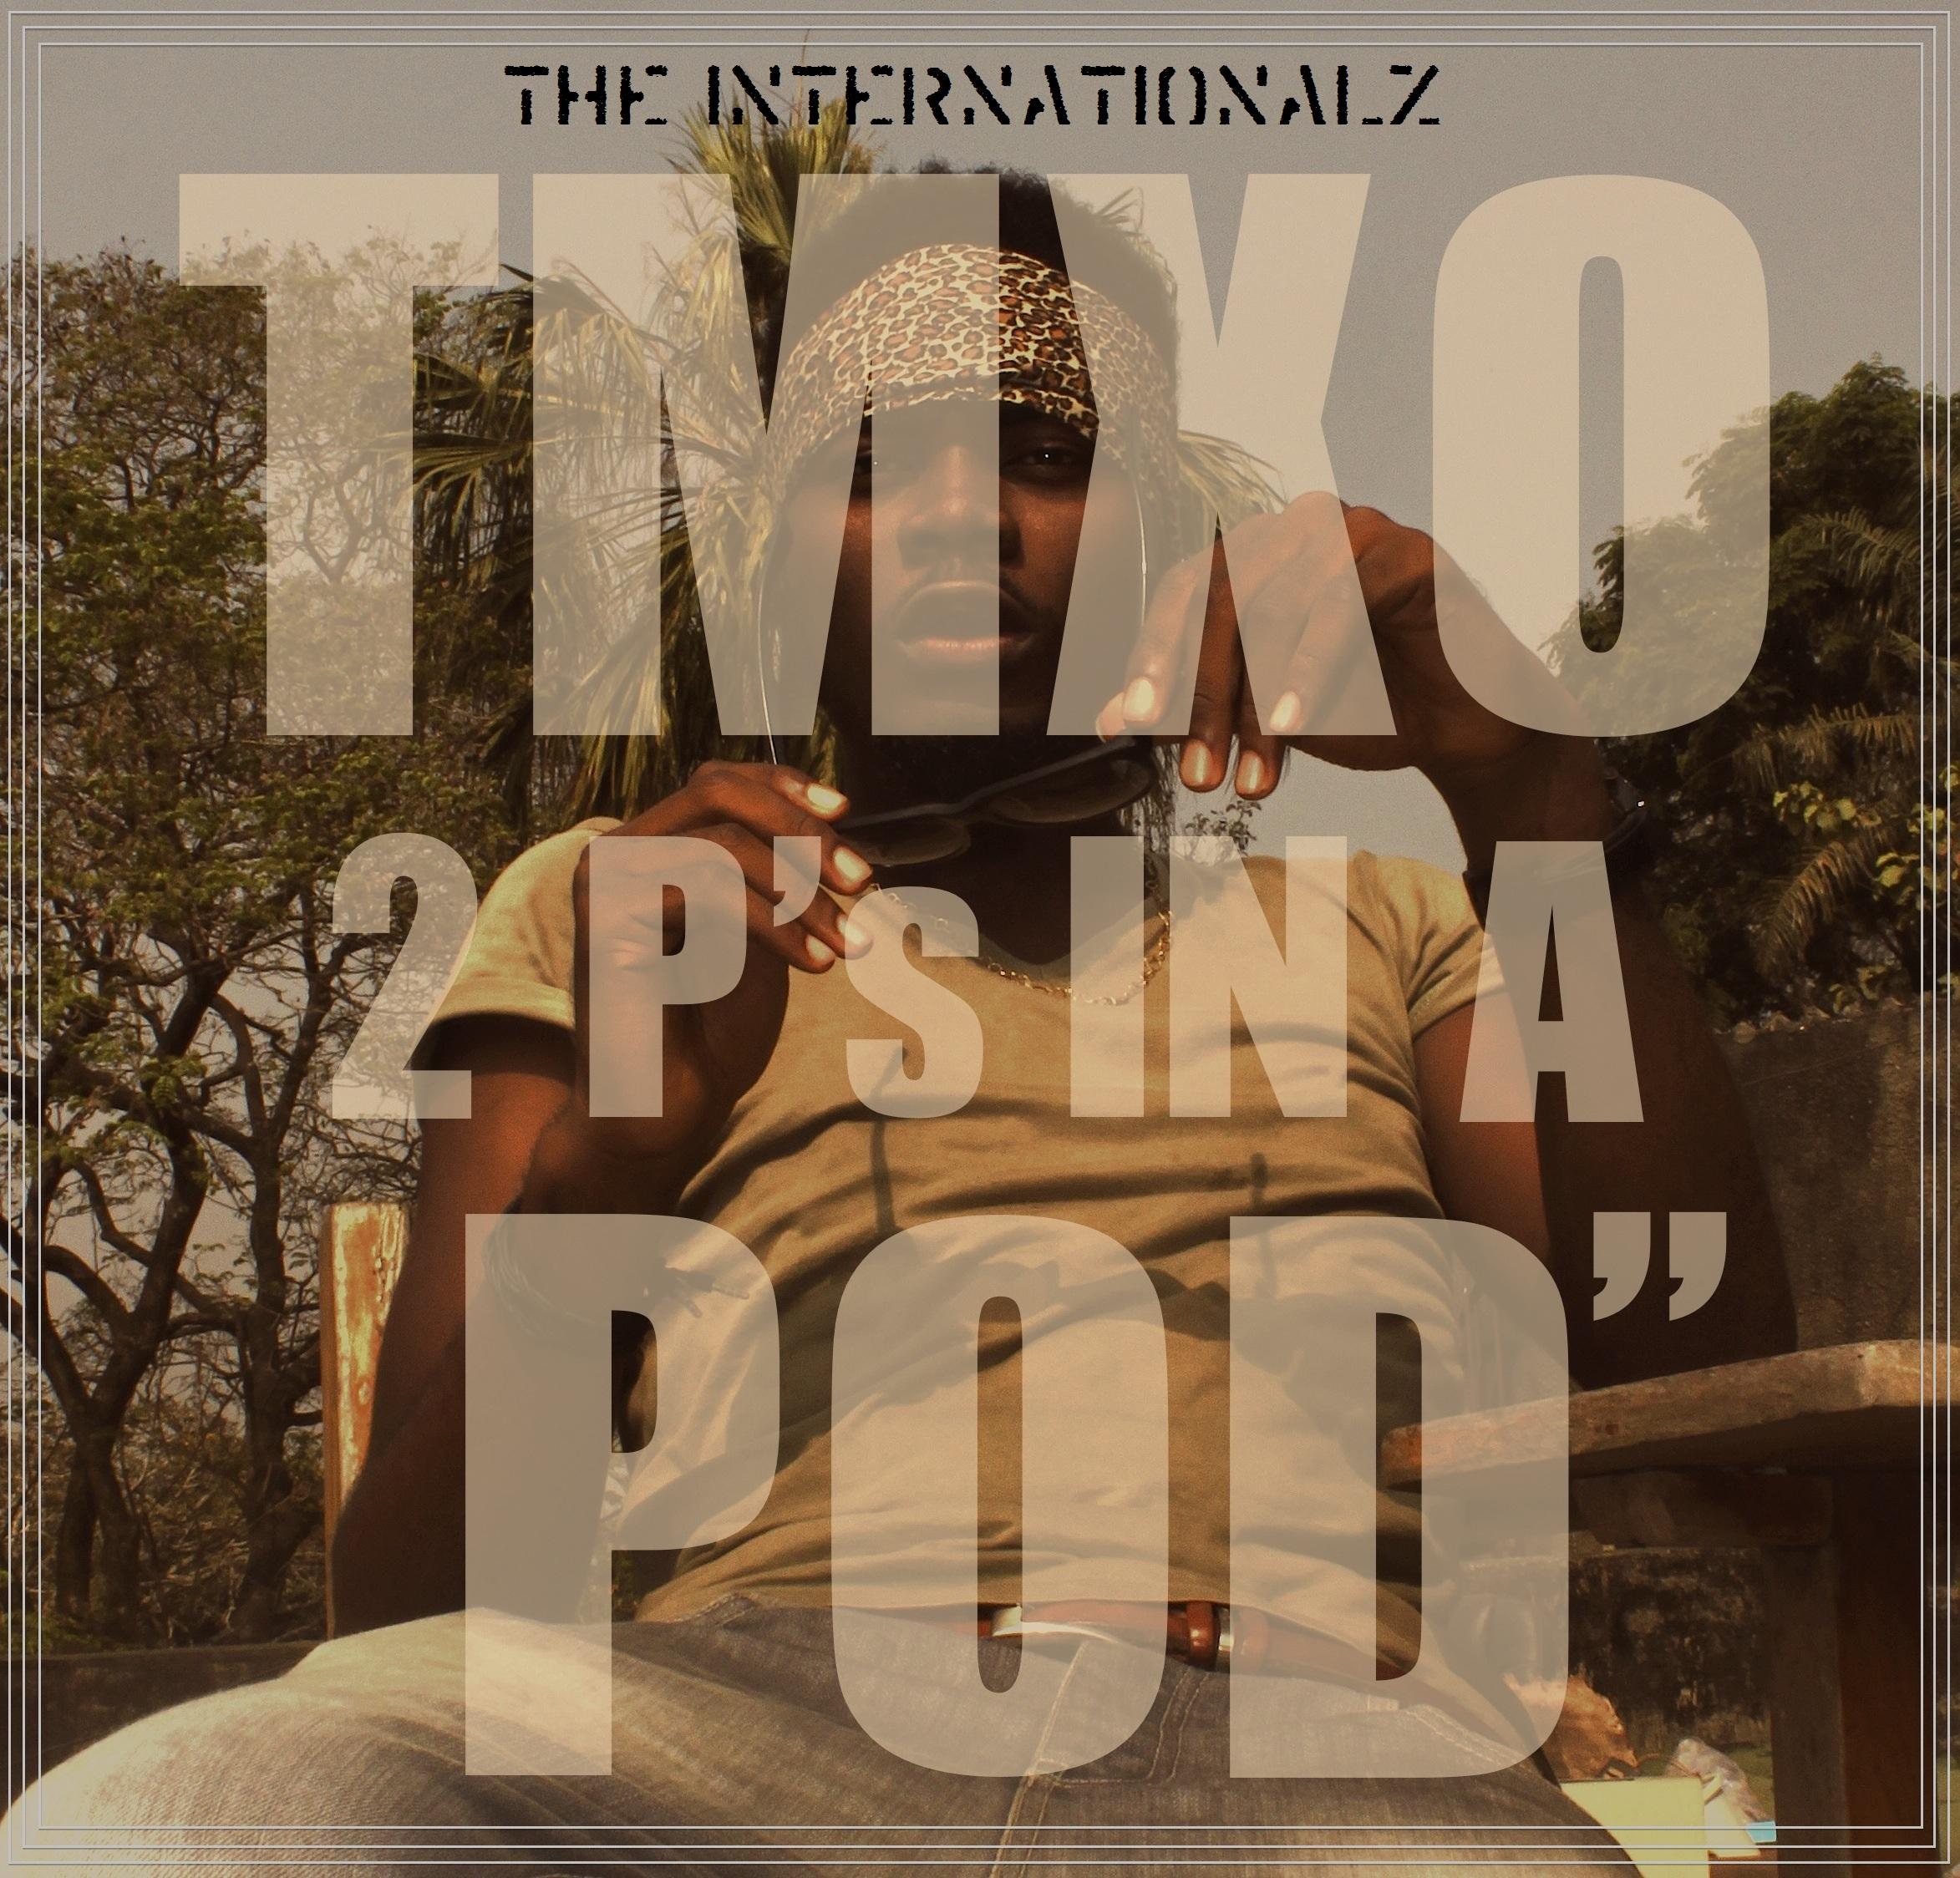 TMXO 2P's In A Pod